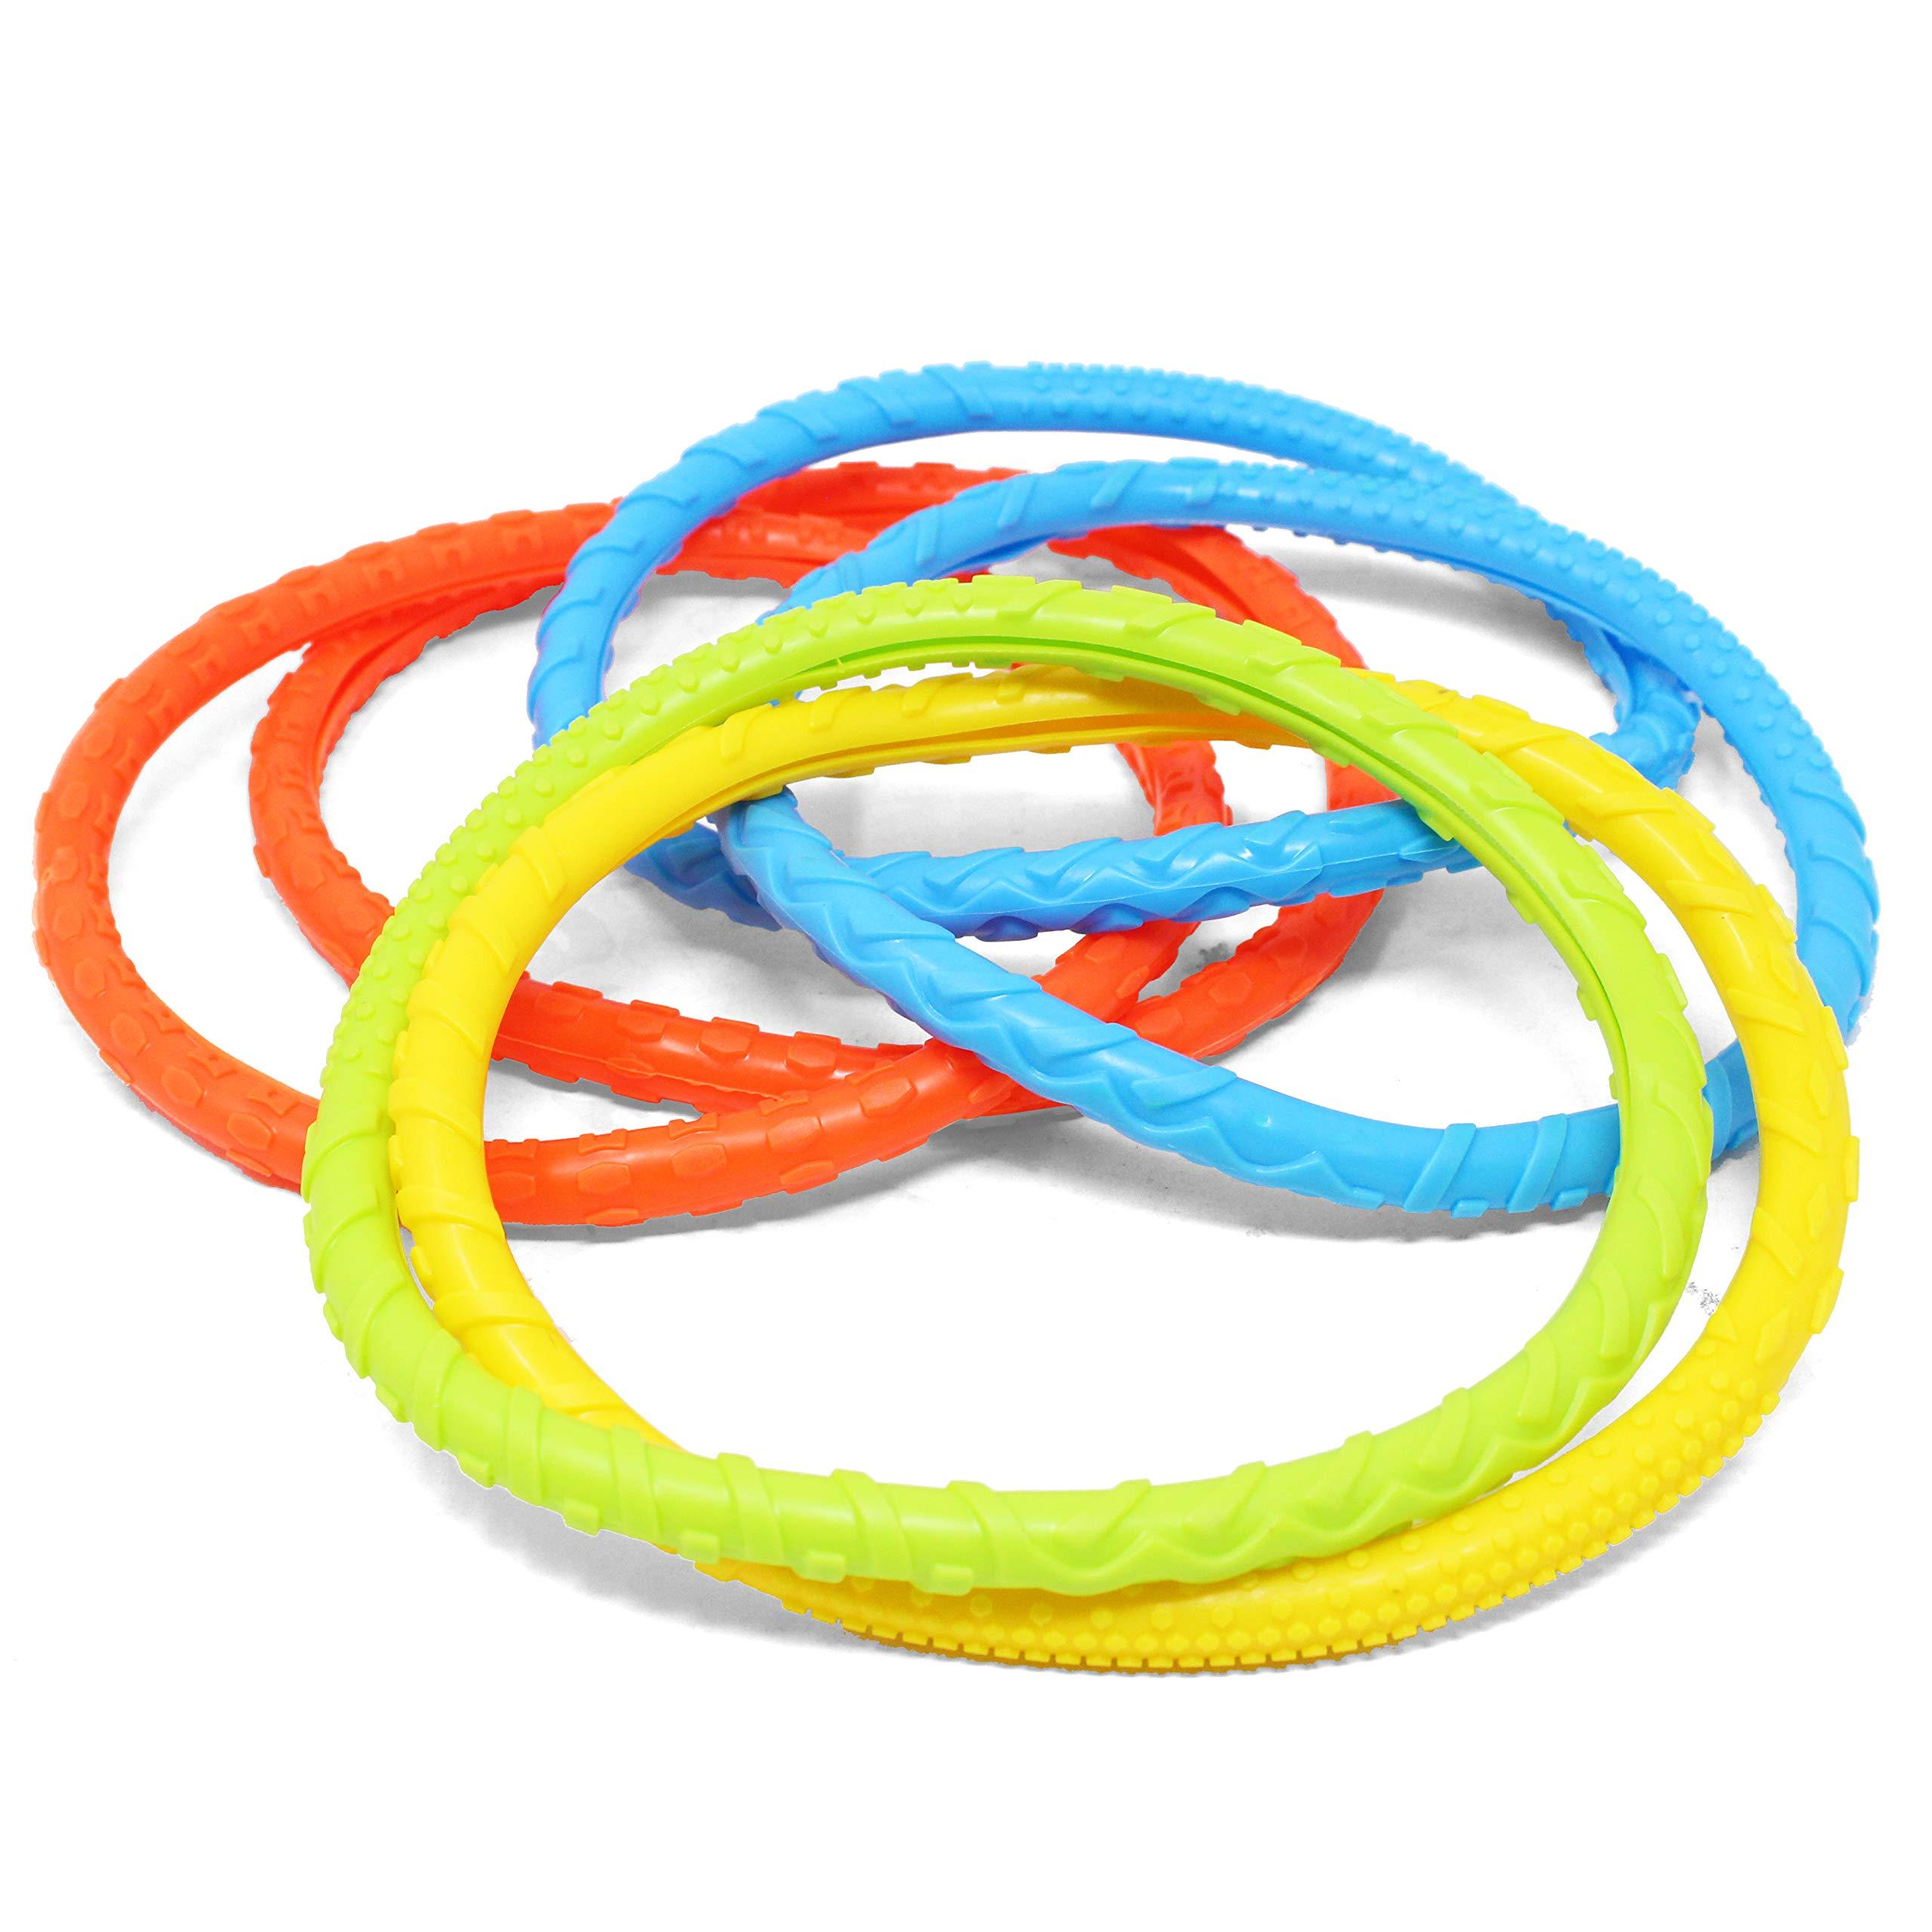 JOYIN 30 Pcs Diving Pool Toys Jumbo Set Includes (5) Diving Sticks, (6) Diving Rings, (5) Pirate Treasures, (4) Toypedo Bandits, (3) Diving Toy Balls, (3) Fish Toys, (4) Stringy Octopus by JOYIN (Image #4)